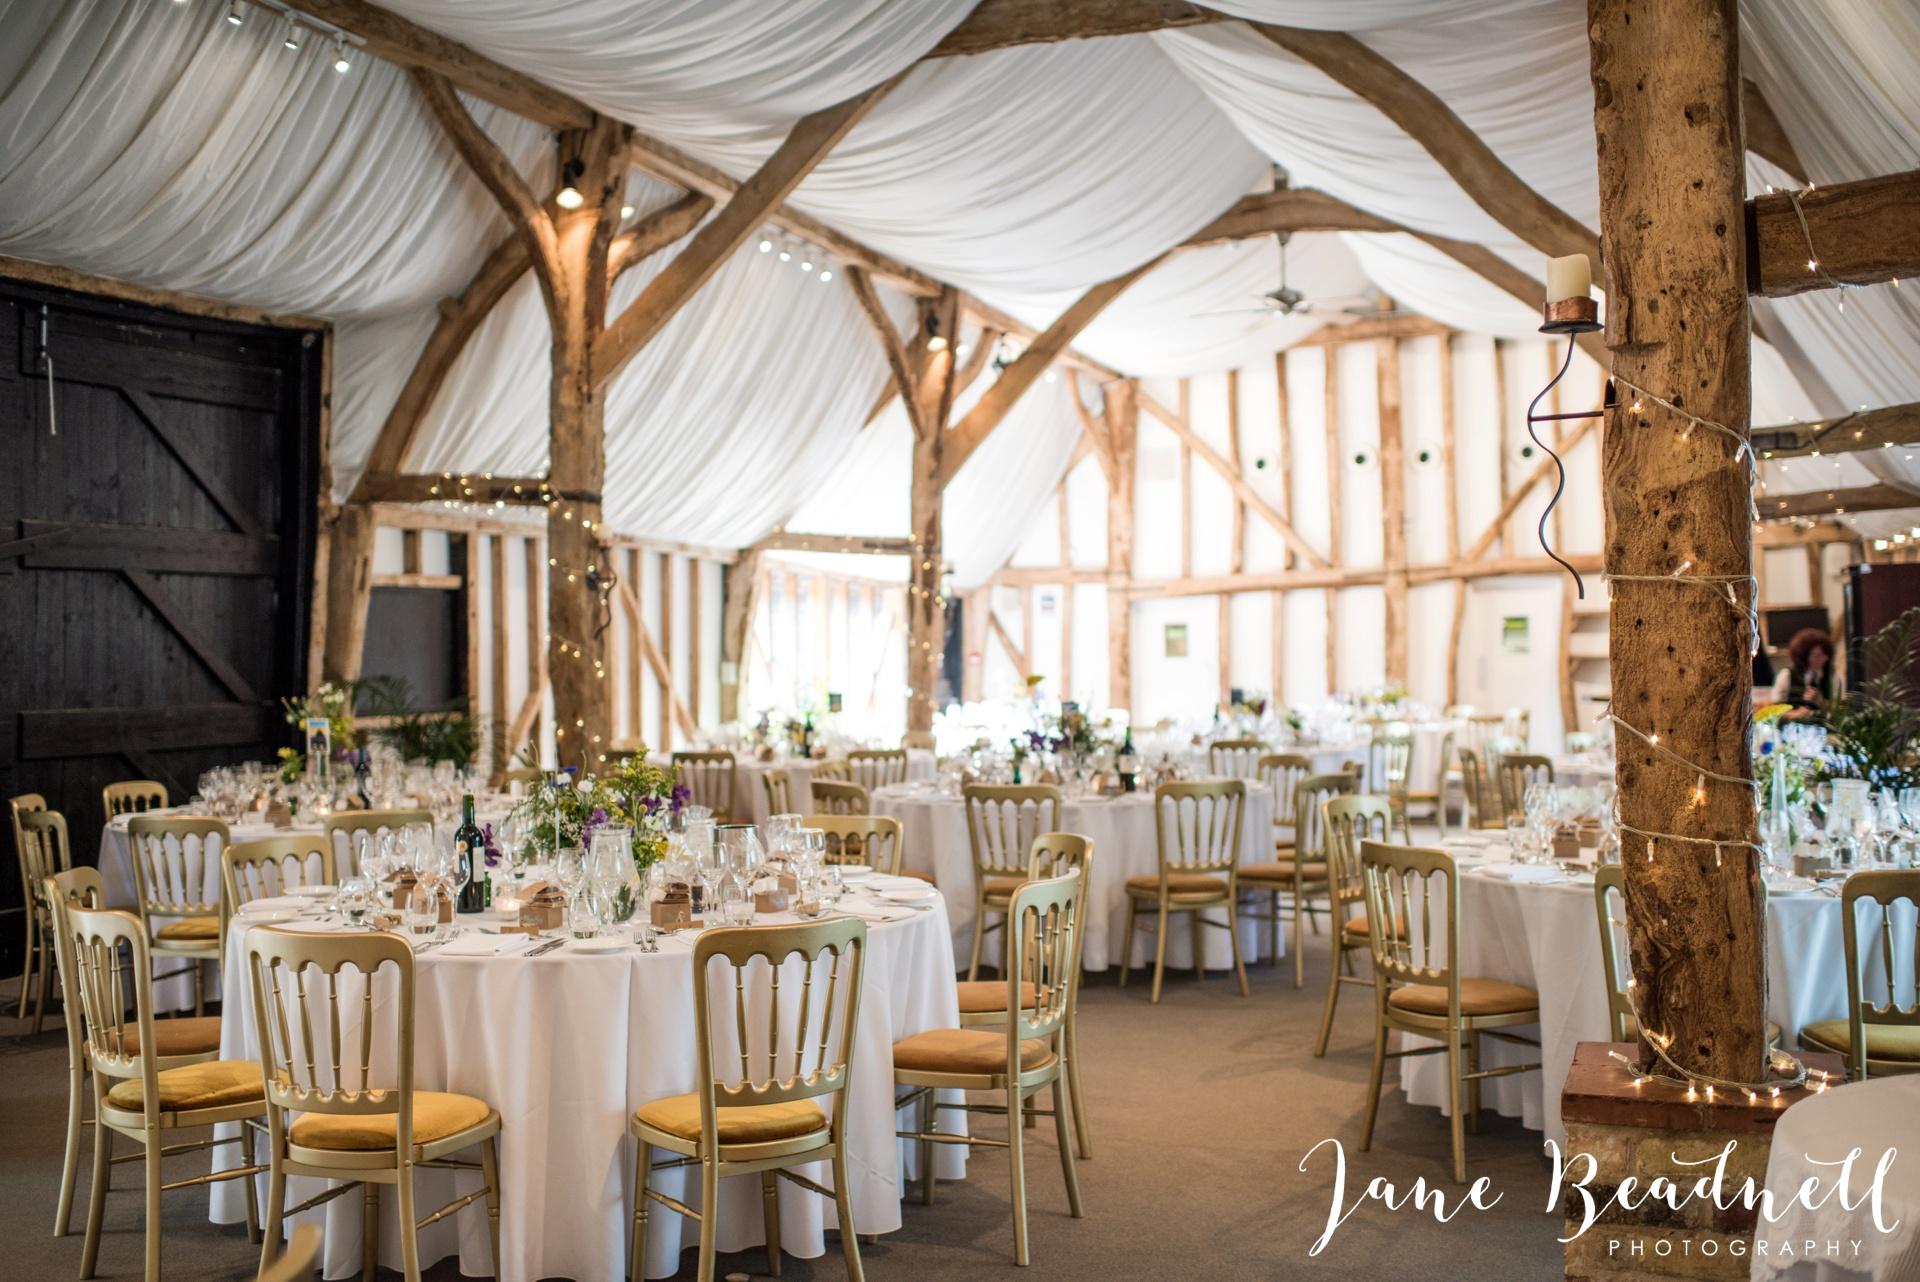 South Farm Wedding photography Hertfordshire by Jane Beadnell Photography fine art wedding photographer_0155